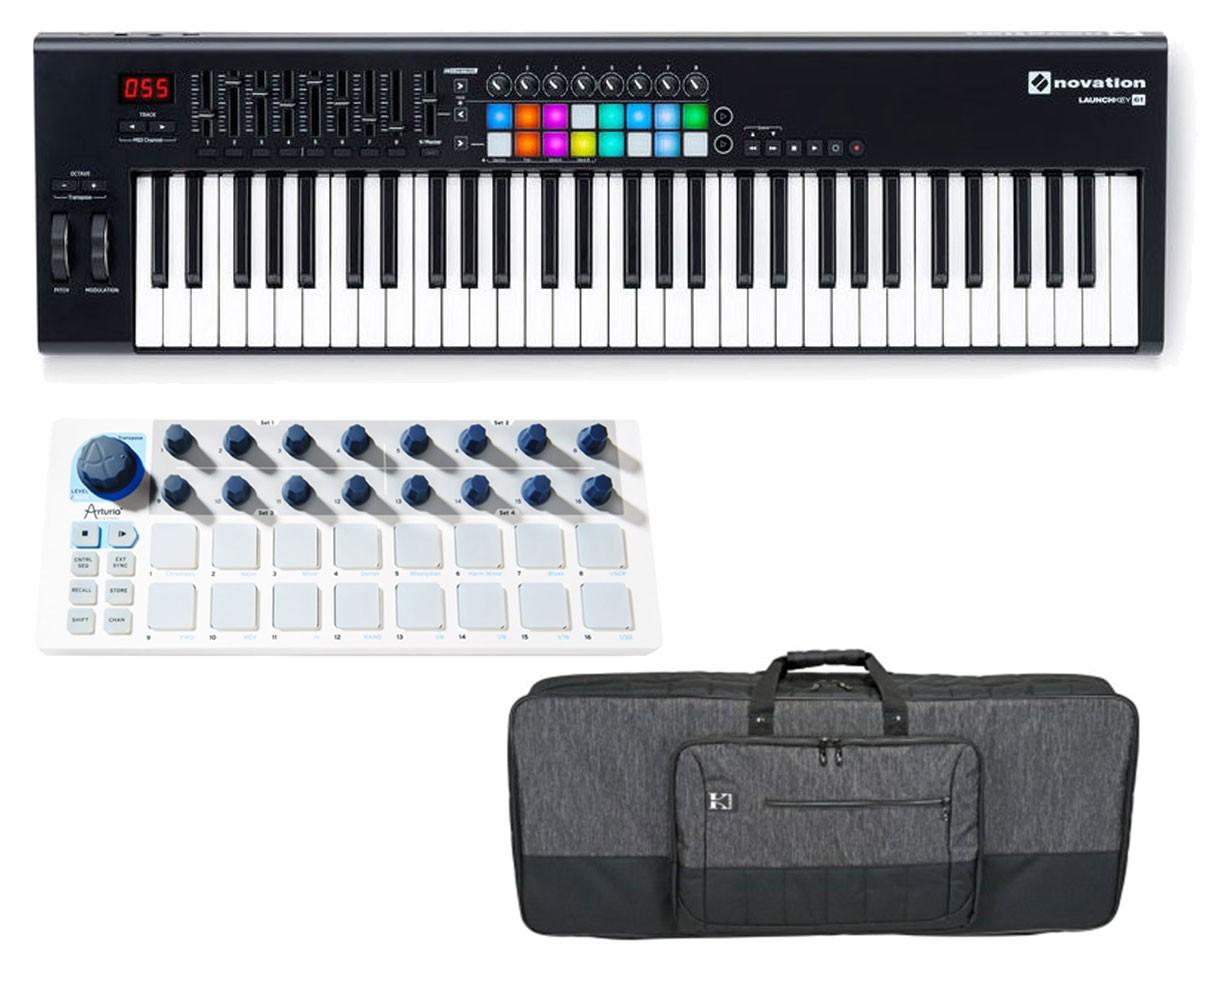 Novation Launchkey 61-Key MIDI Controller + Arturia Beatstep + Bag